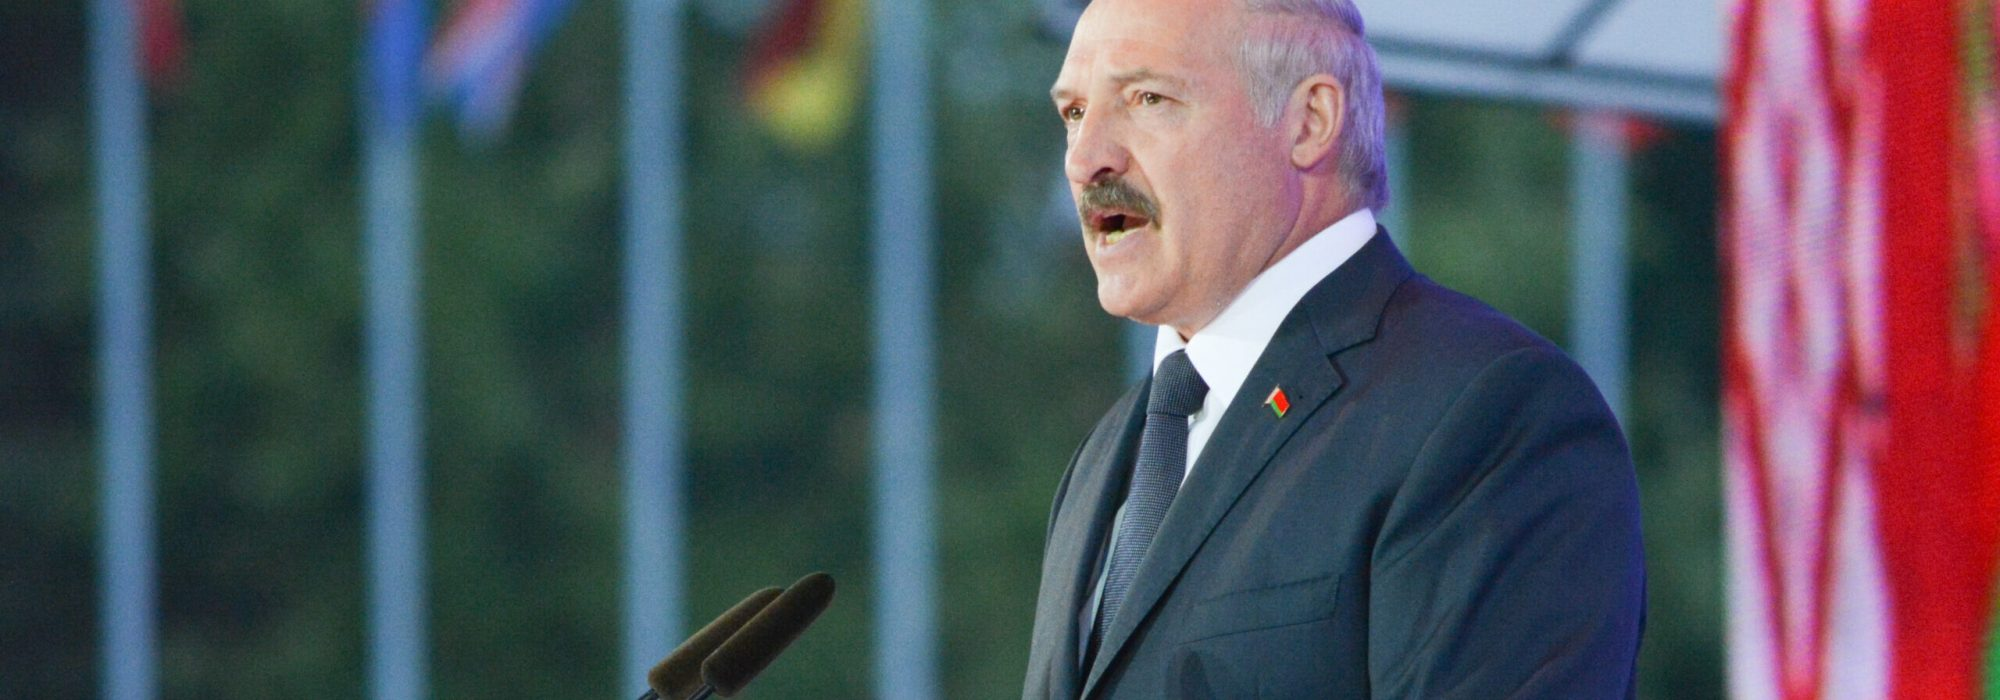 Alexander_Lukashenko,_opening_of_Slavianski_Bazar_2014